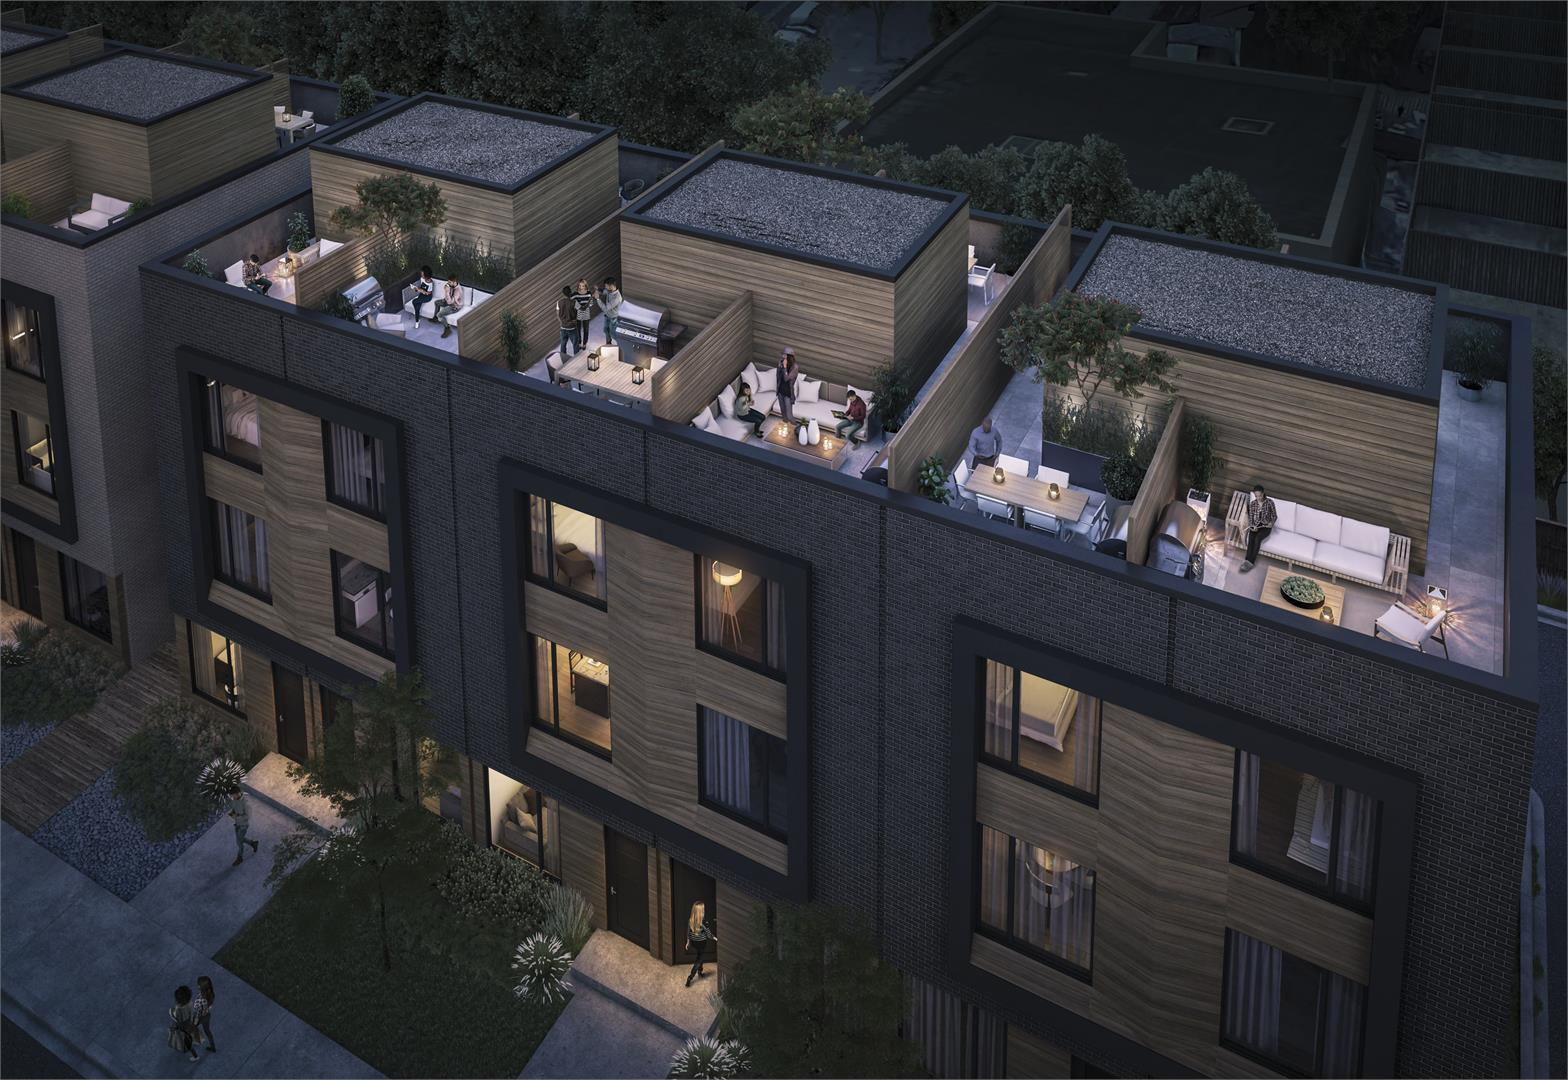 TerracesAtEglinton_Exterior3